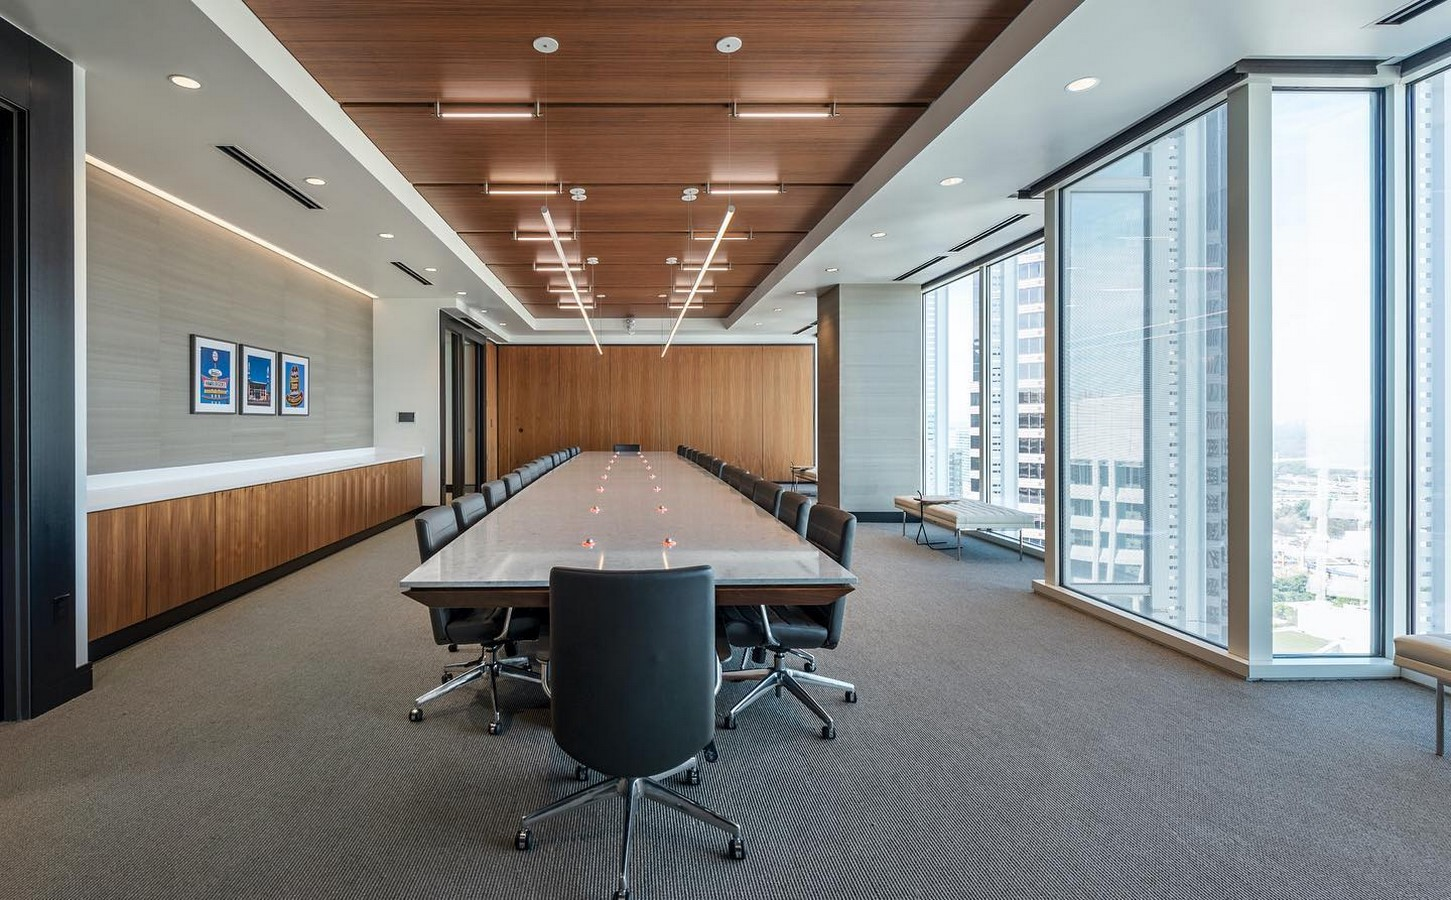 Roark Capital Group Corporate Office Renovation at Atlanta, Georgia - Sheet2